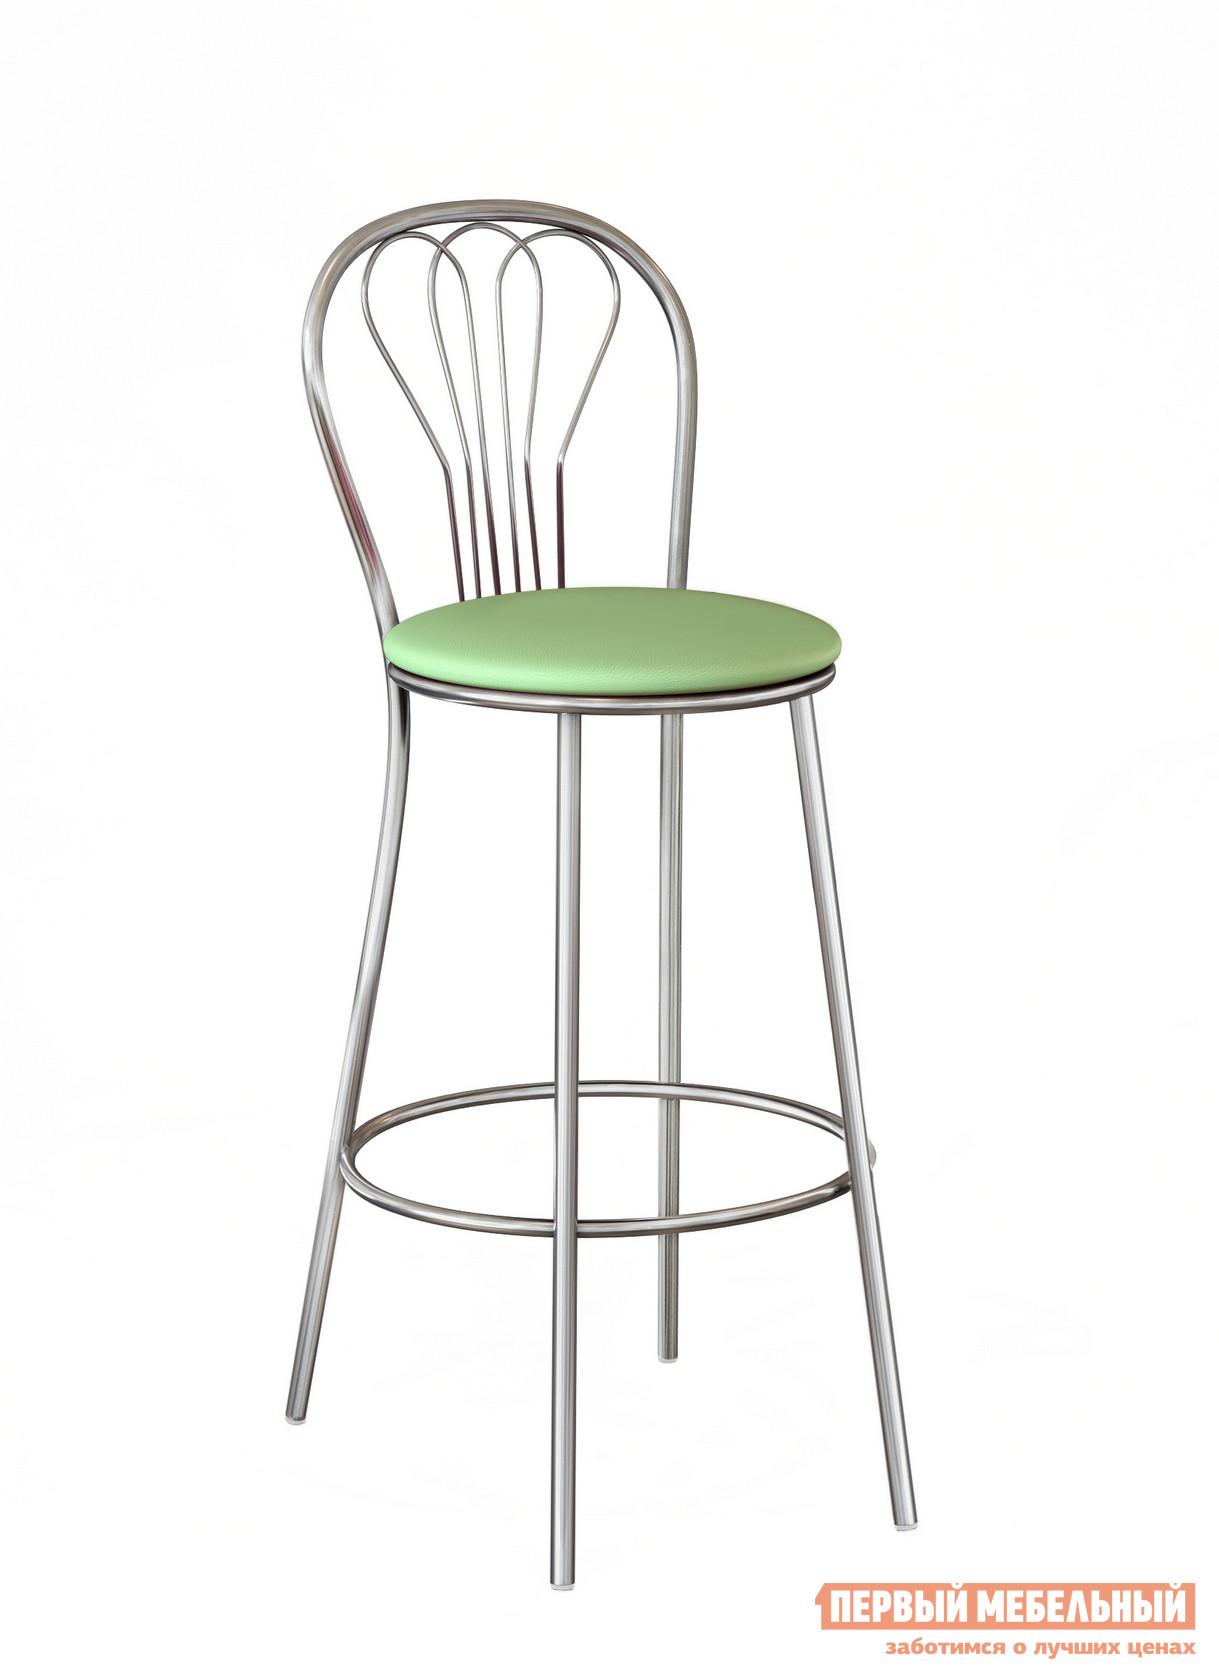 Барный стул Первый Мебельный Стул барный Рио стул барный avanti bcr first